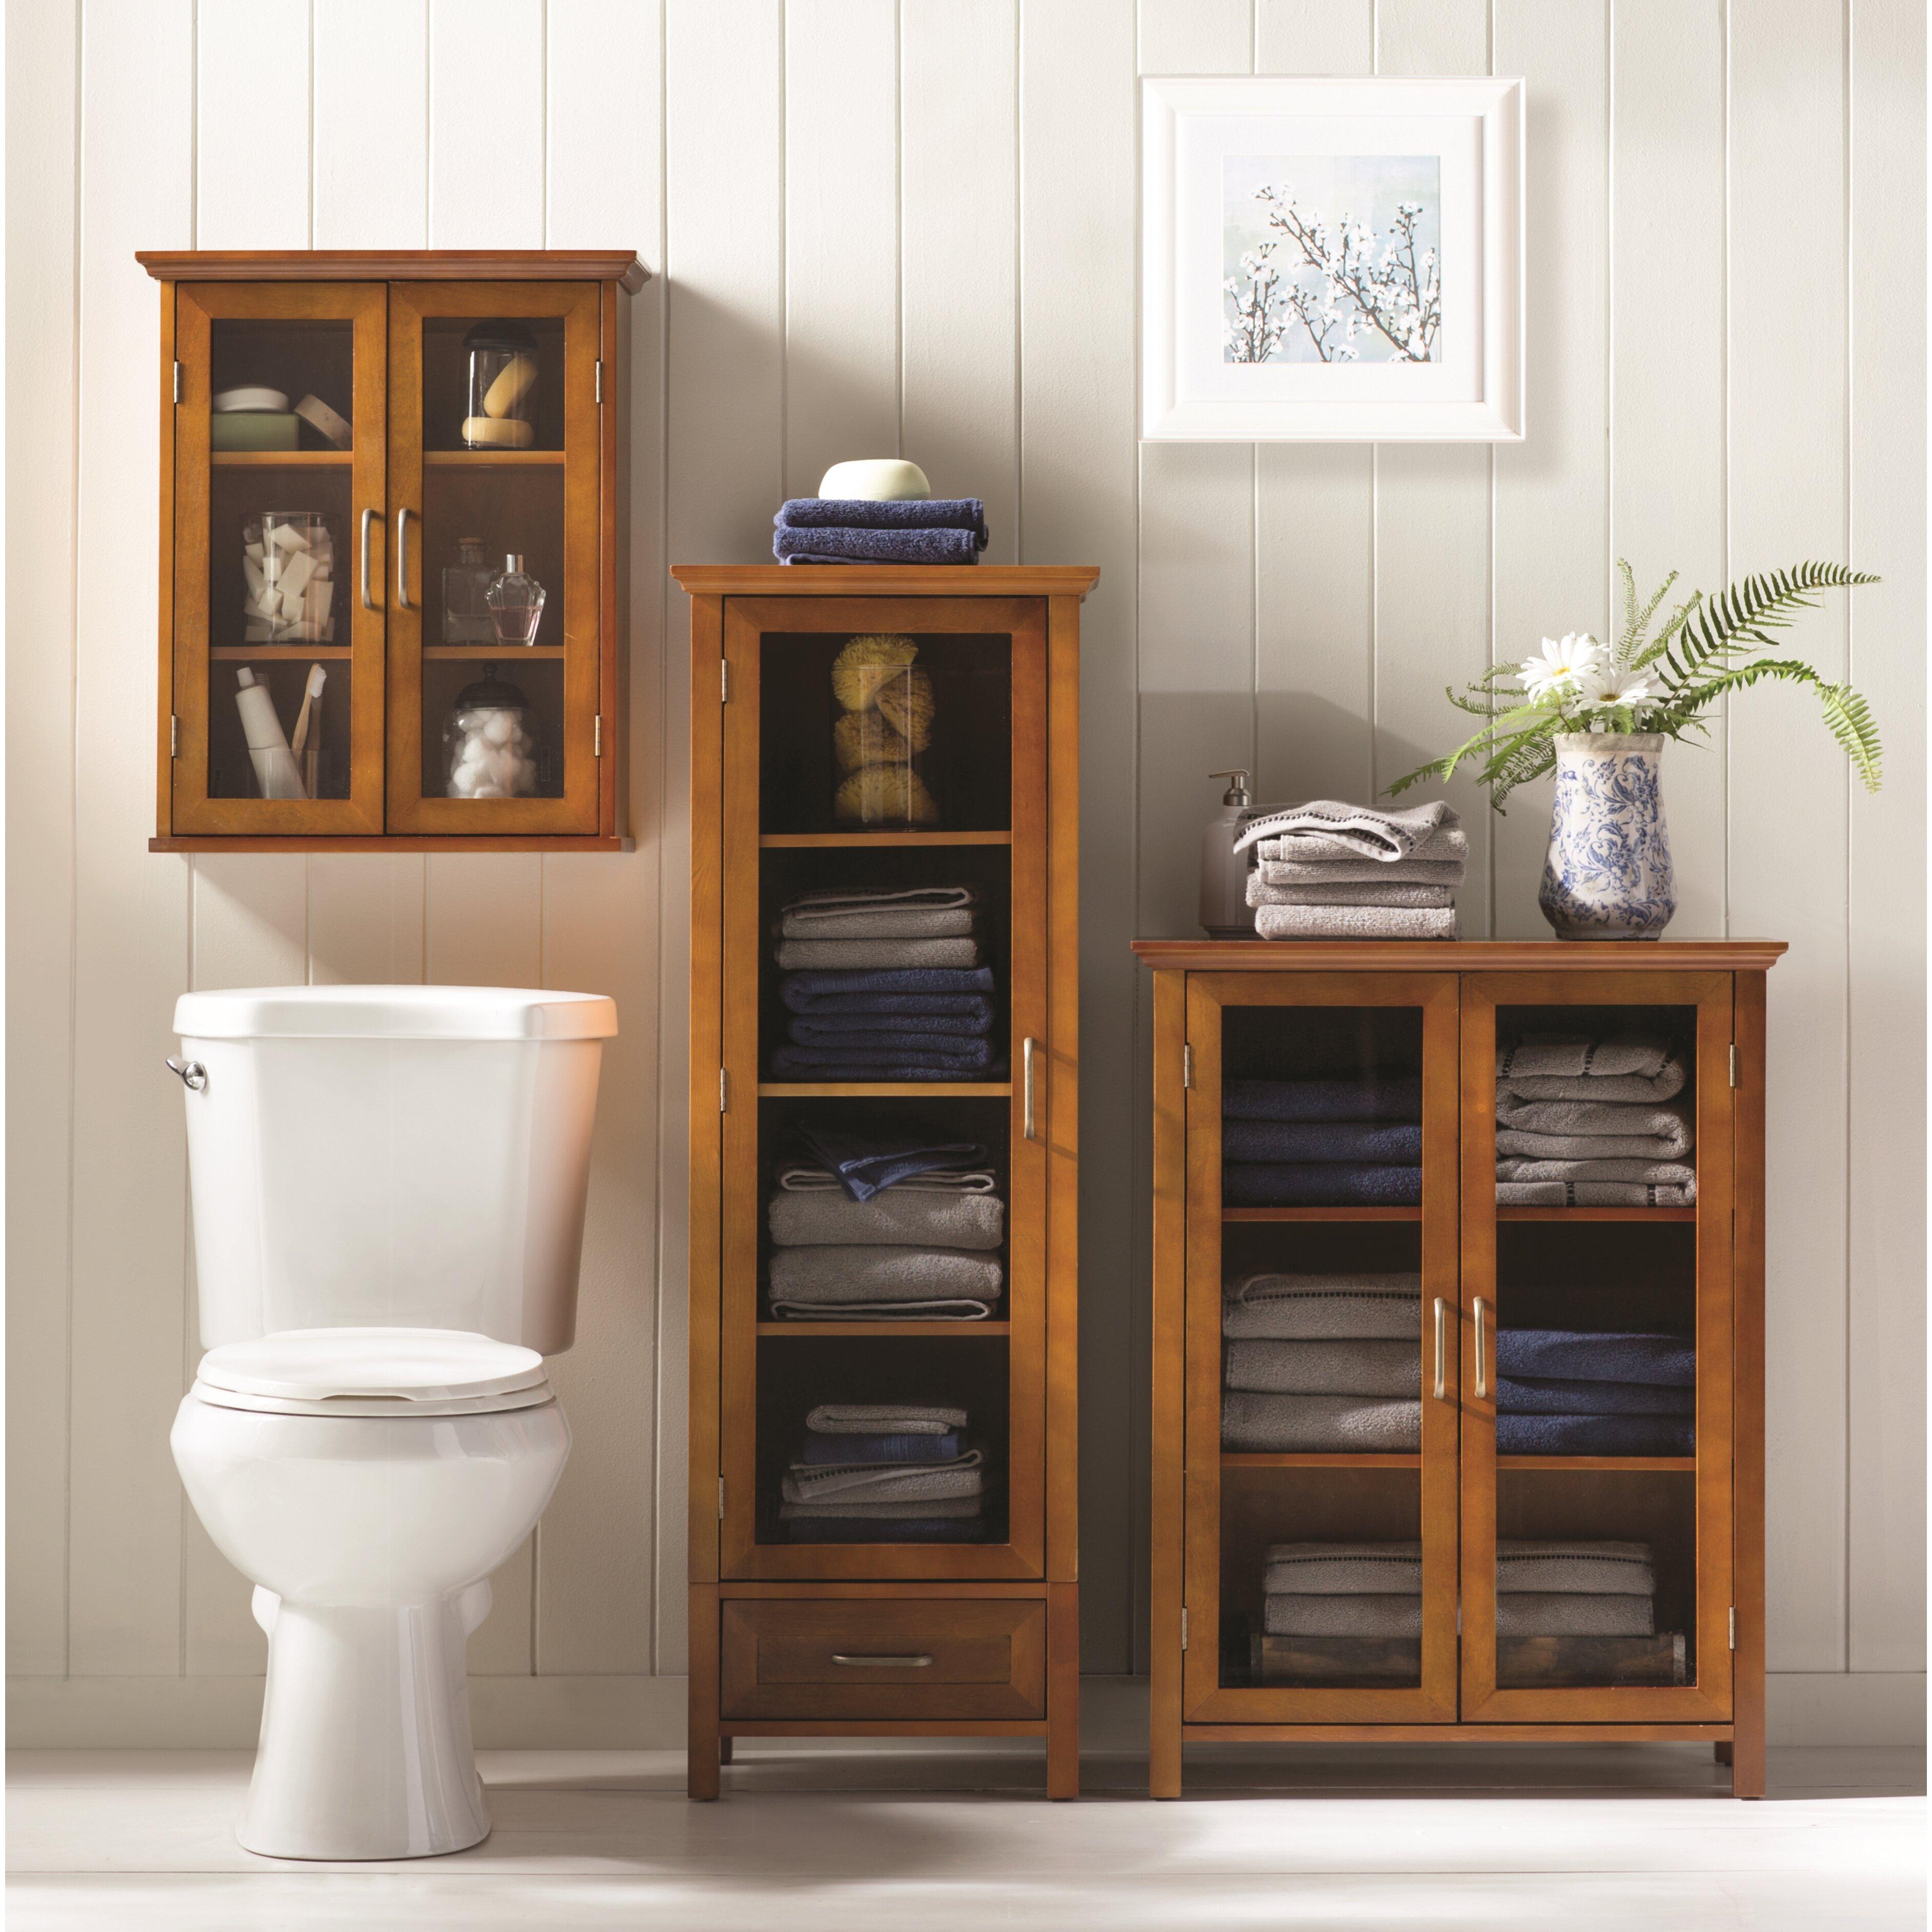 Elegant Home Fashions Avery 20 5 quot  W x 24 quot. Elegant Home Fashions Avery 20 5  W x 24  H Wall Mounted Cabinet